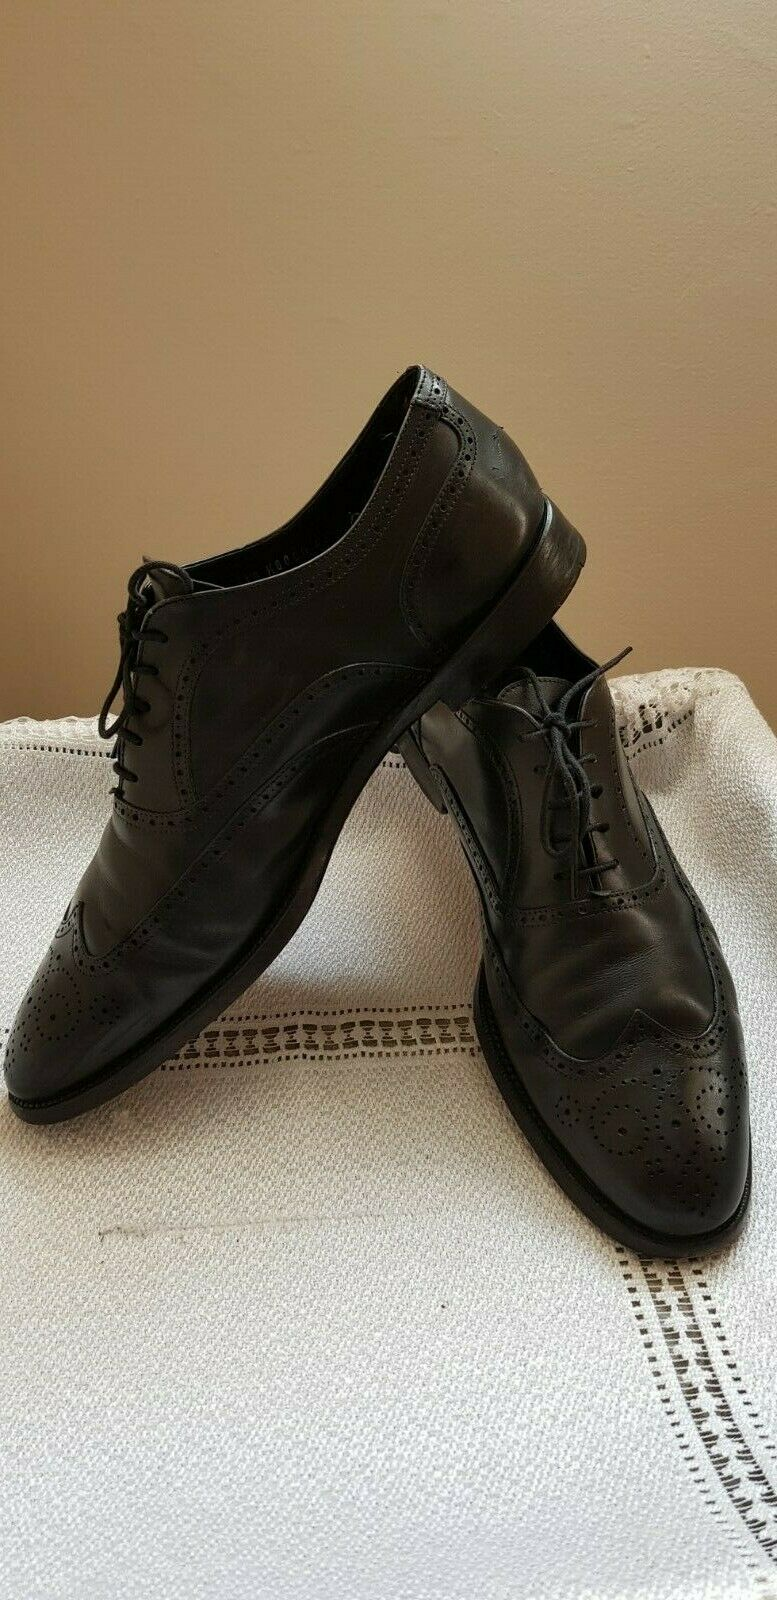 Zapatos de Cuero DUNHILL LONDON hecho a mano en Italia Negro para Hombre-Talla